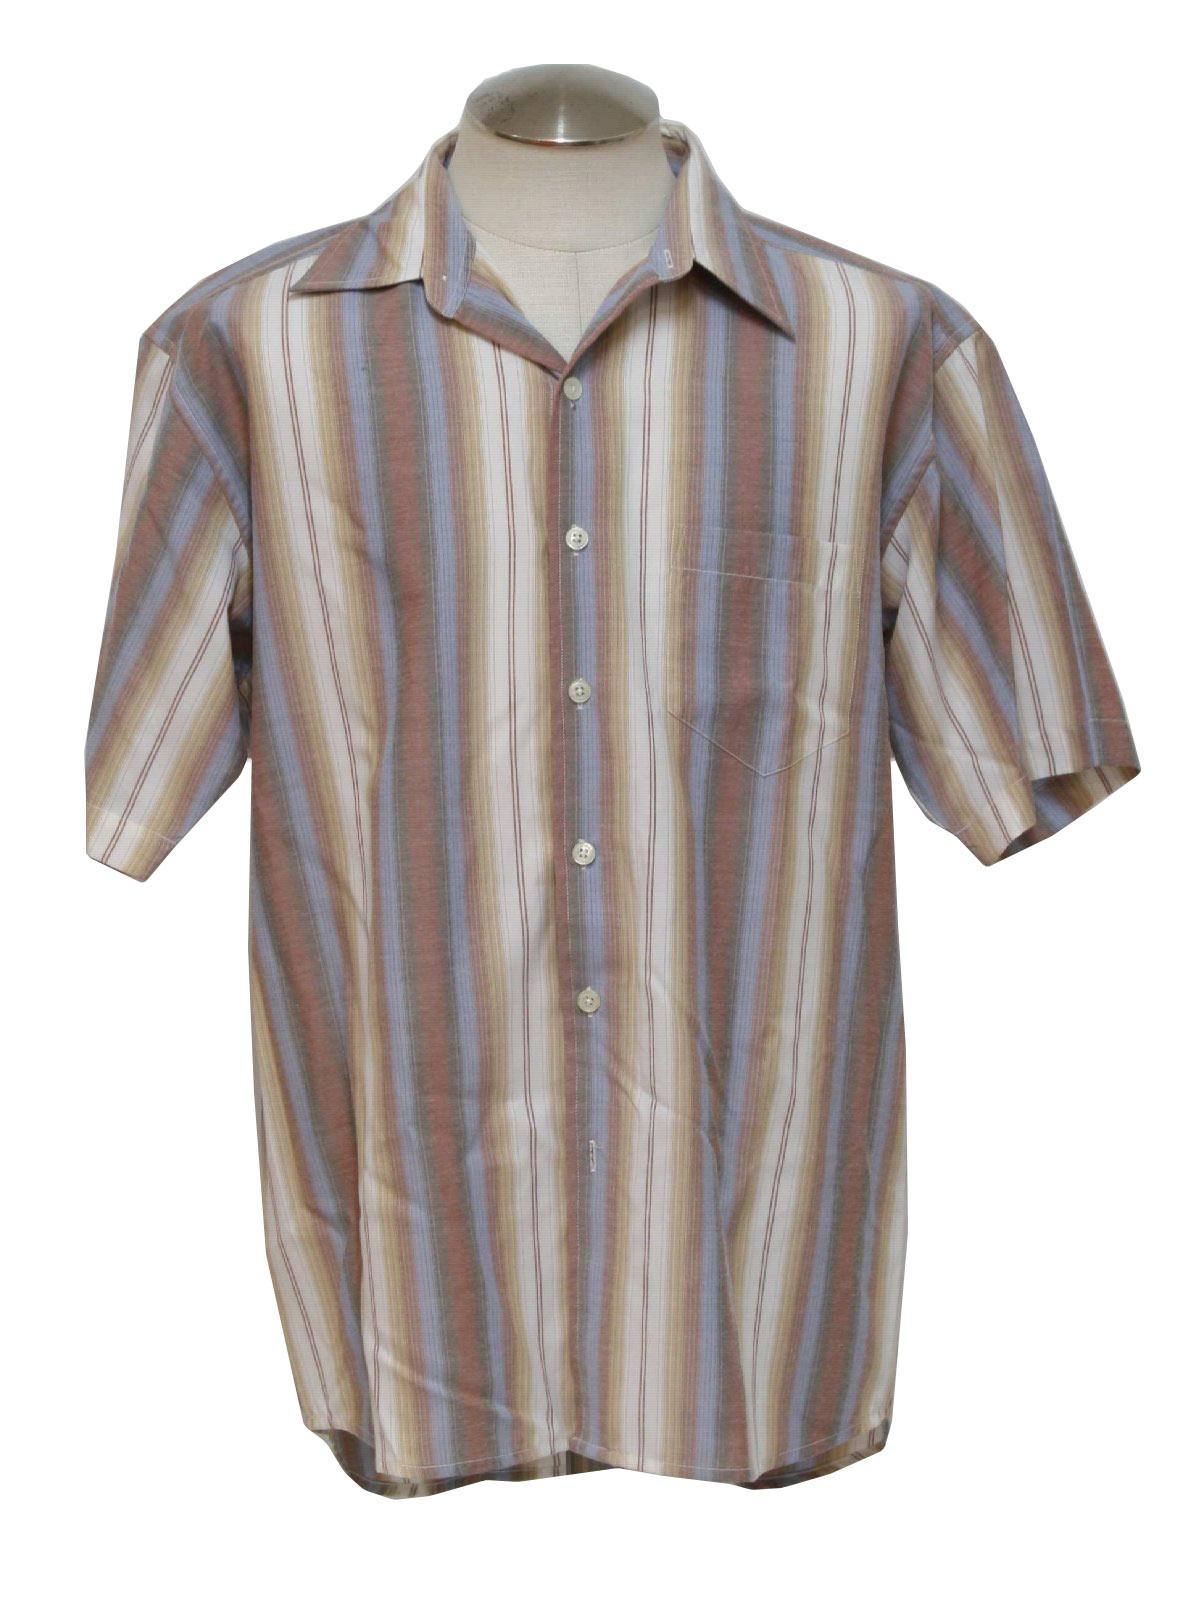 1970s vintage shirt 70s kennington mens white pale for Mens rayon dress shirts